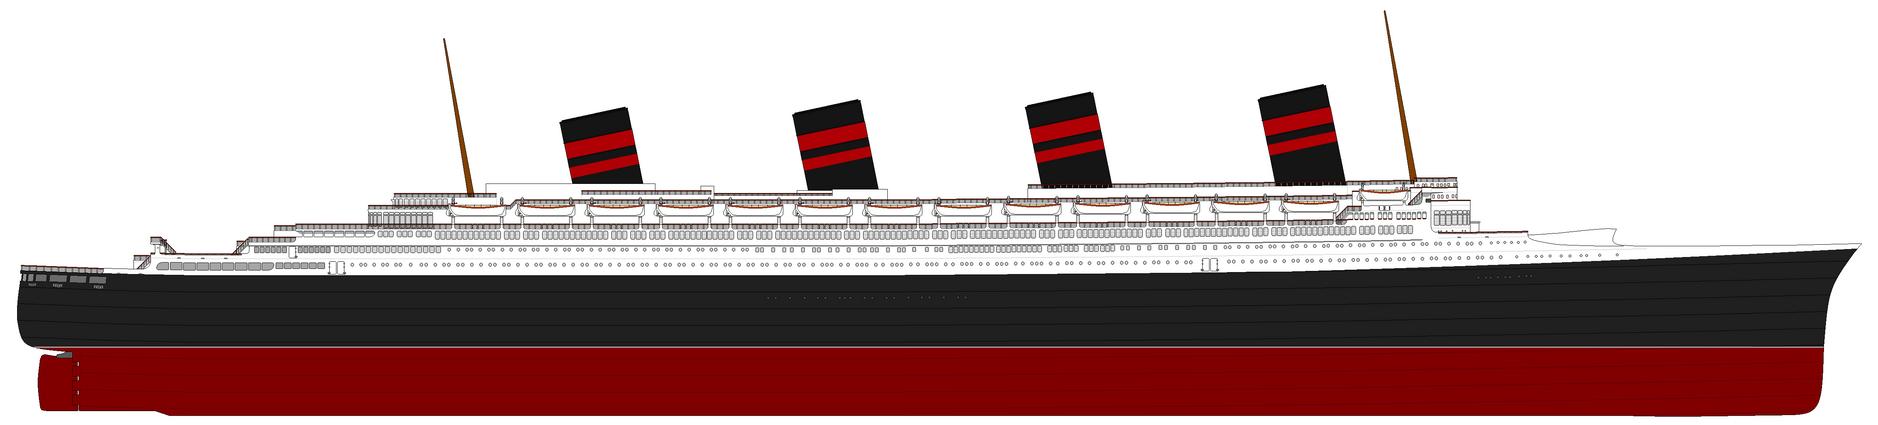 SS Atlas WIP 7 by Quarteon01